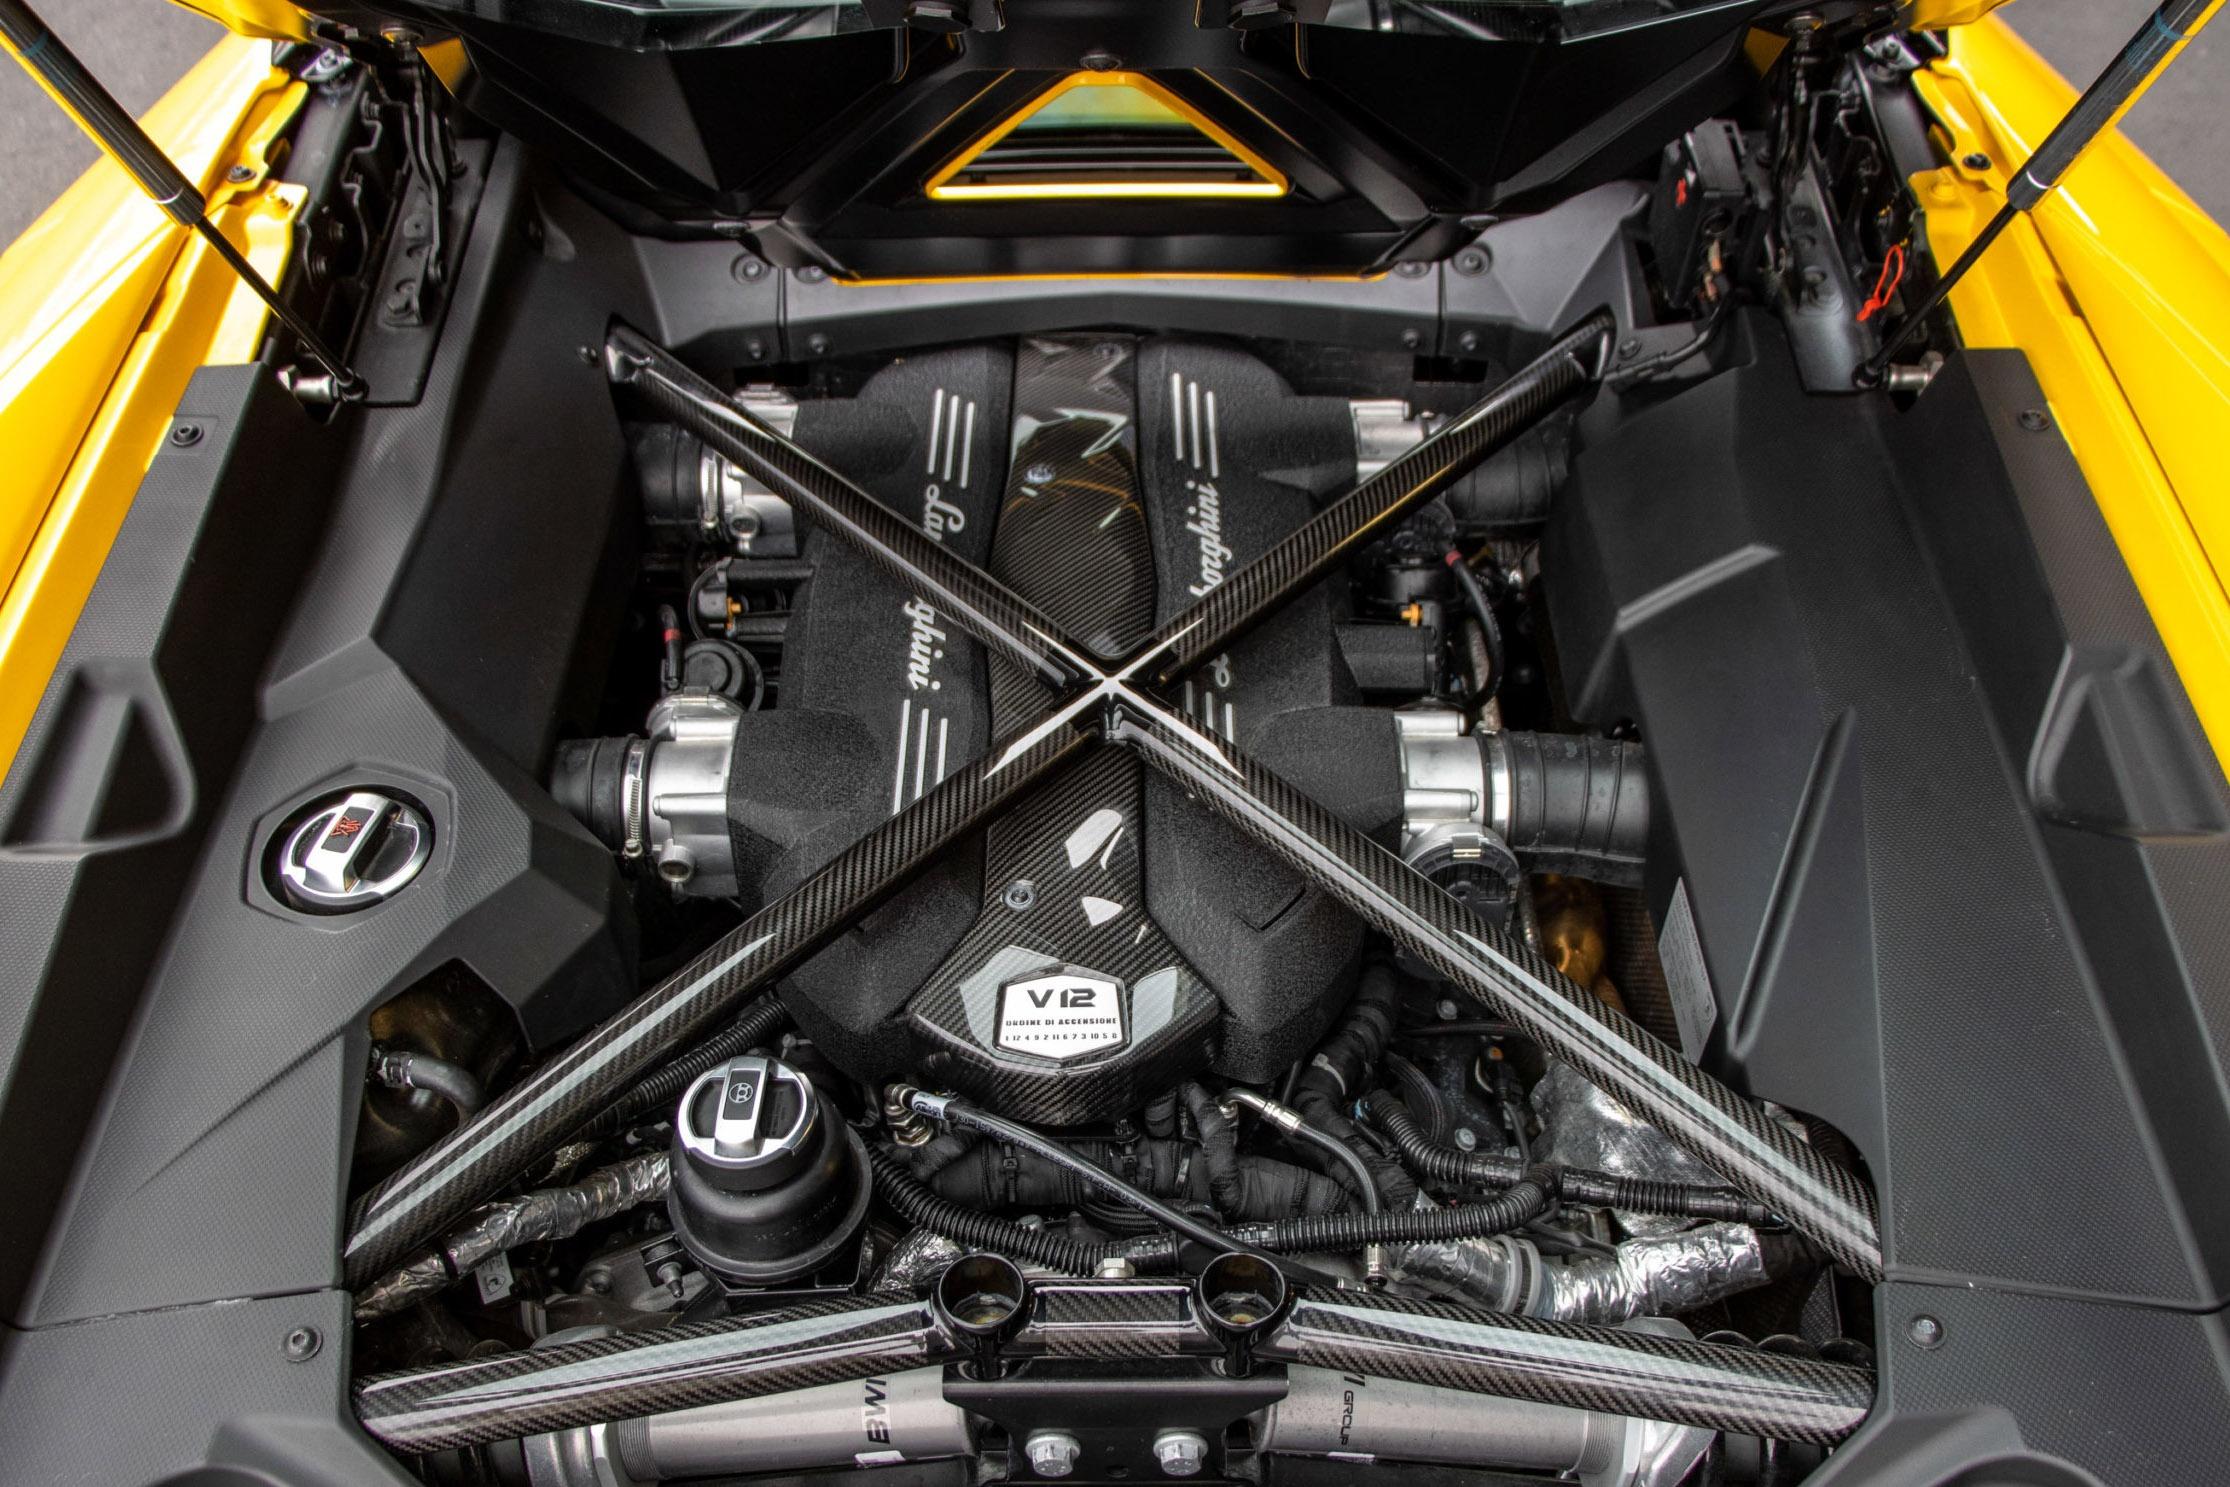 Chi tiết siêu xe Lamborghini Aventador S Roadster của Paulo Dybala - Ảnh 9.